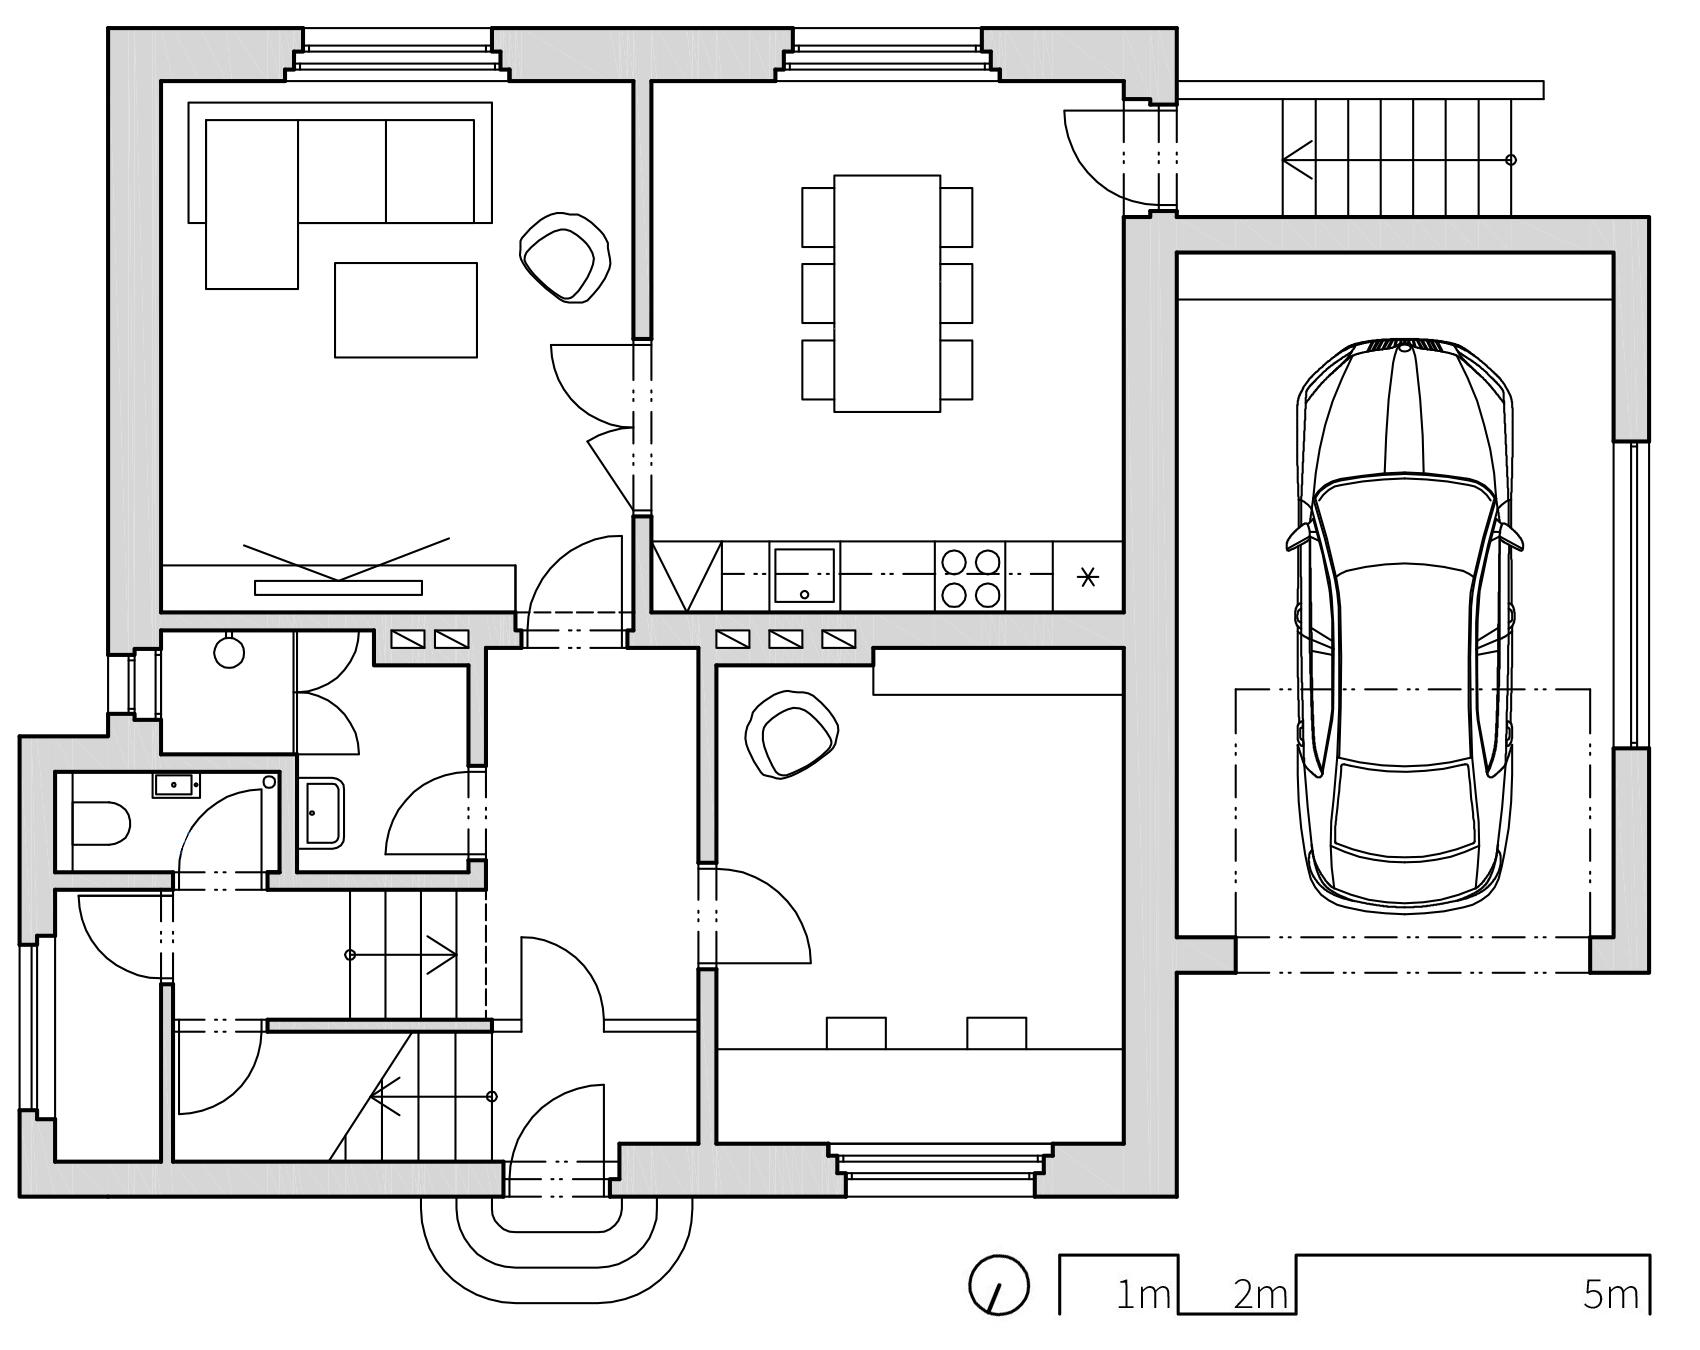 04-1NP-2560-1